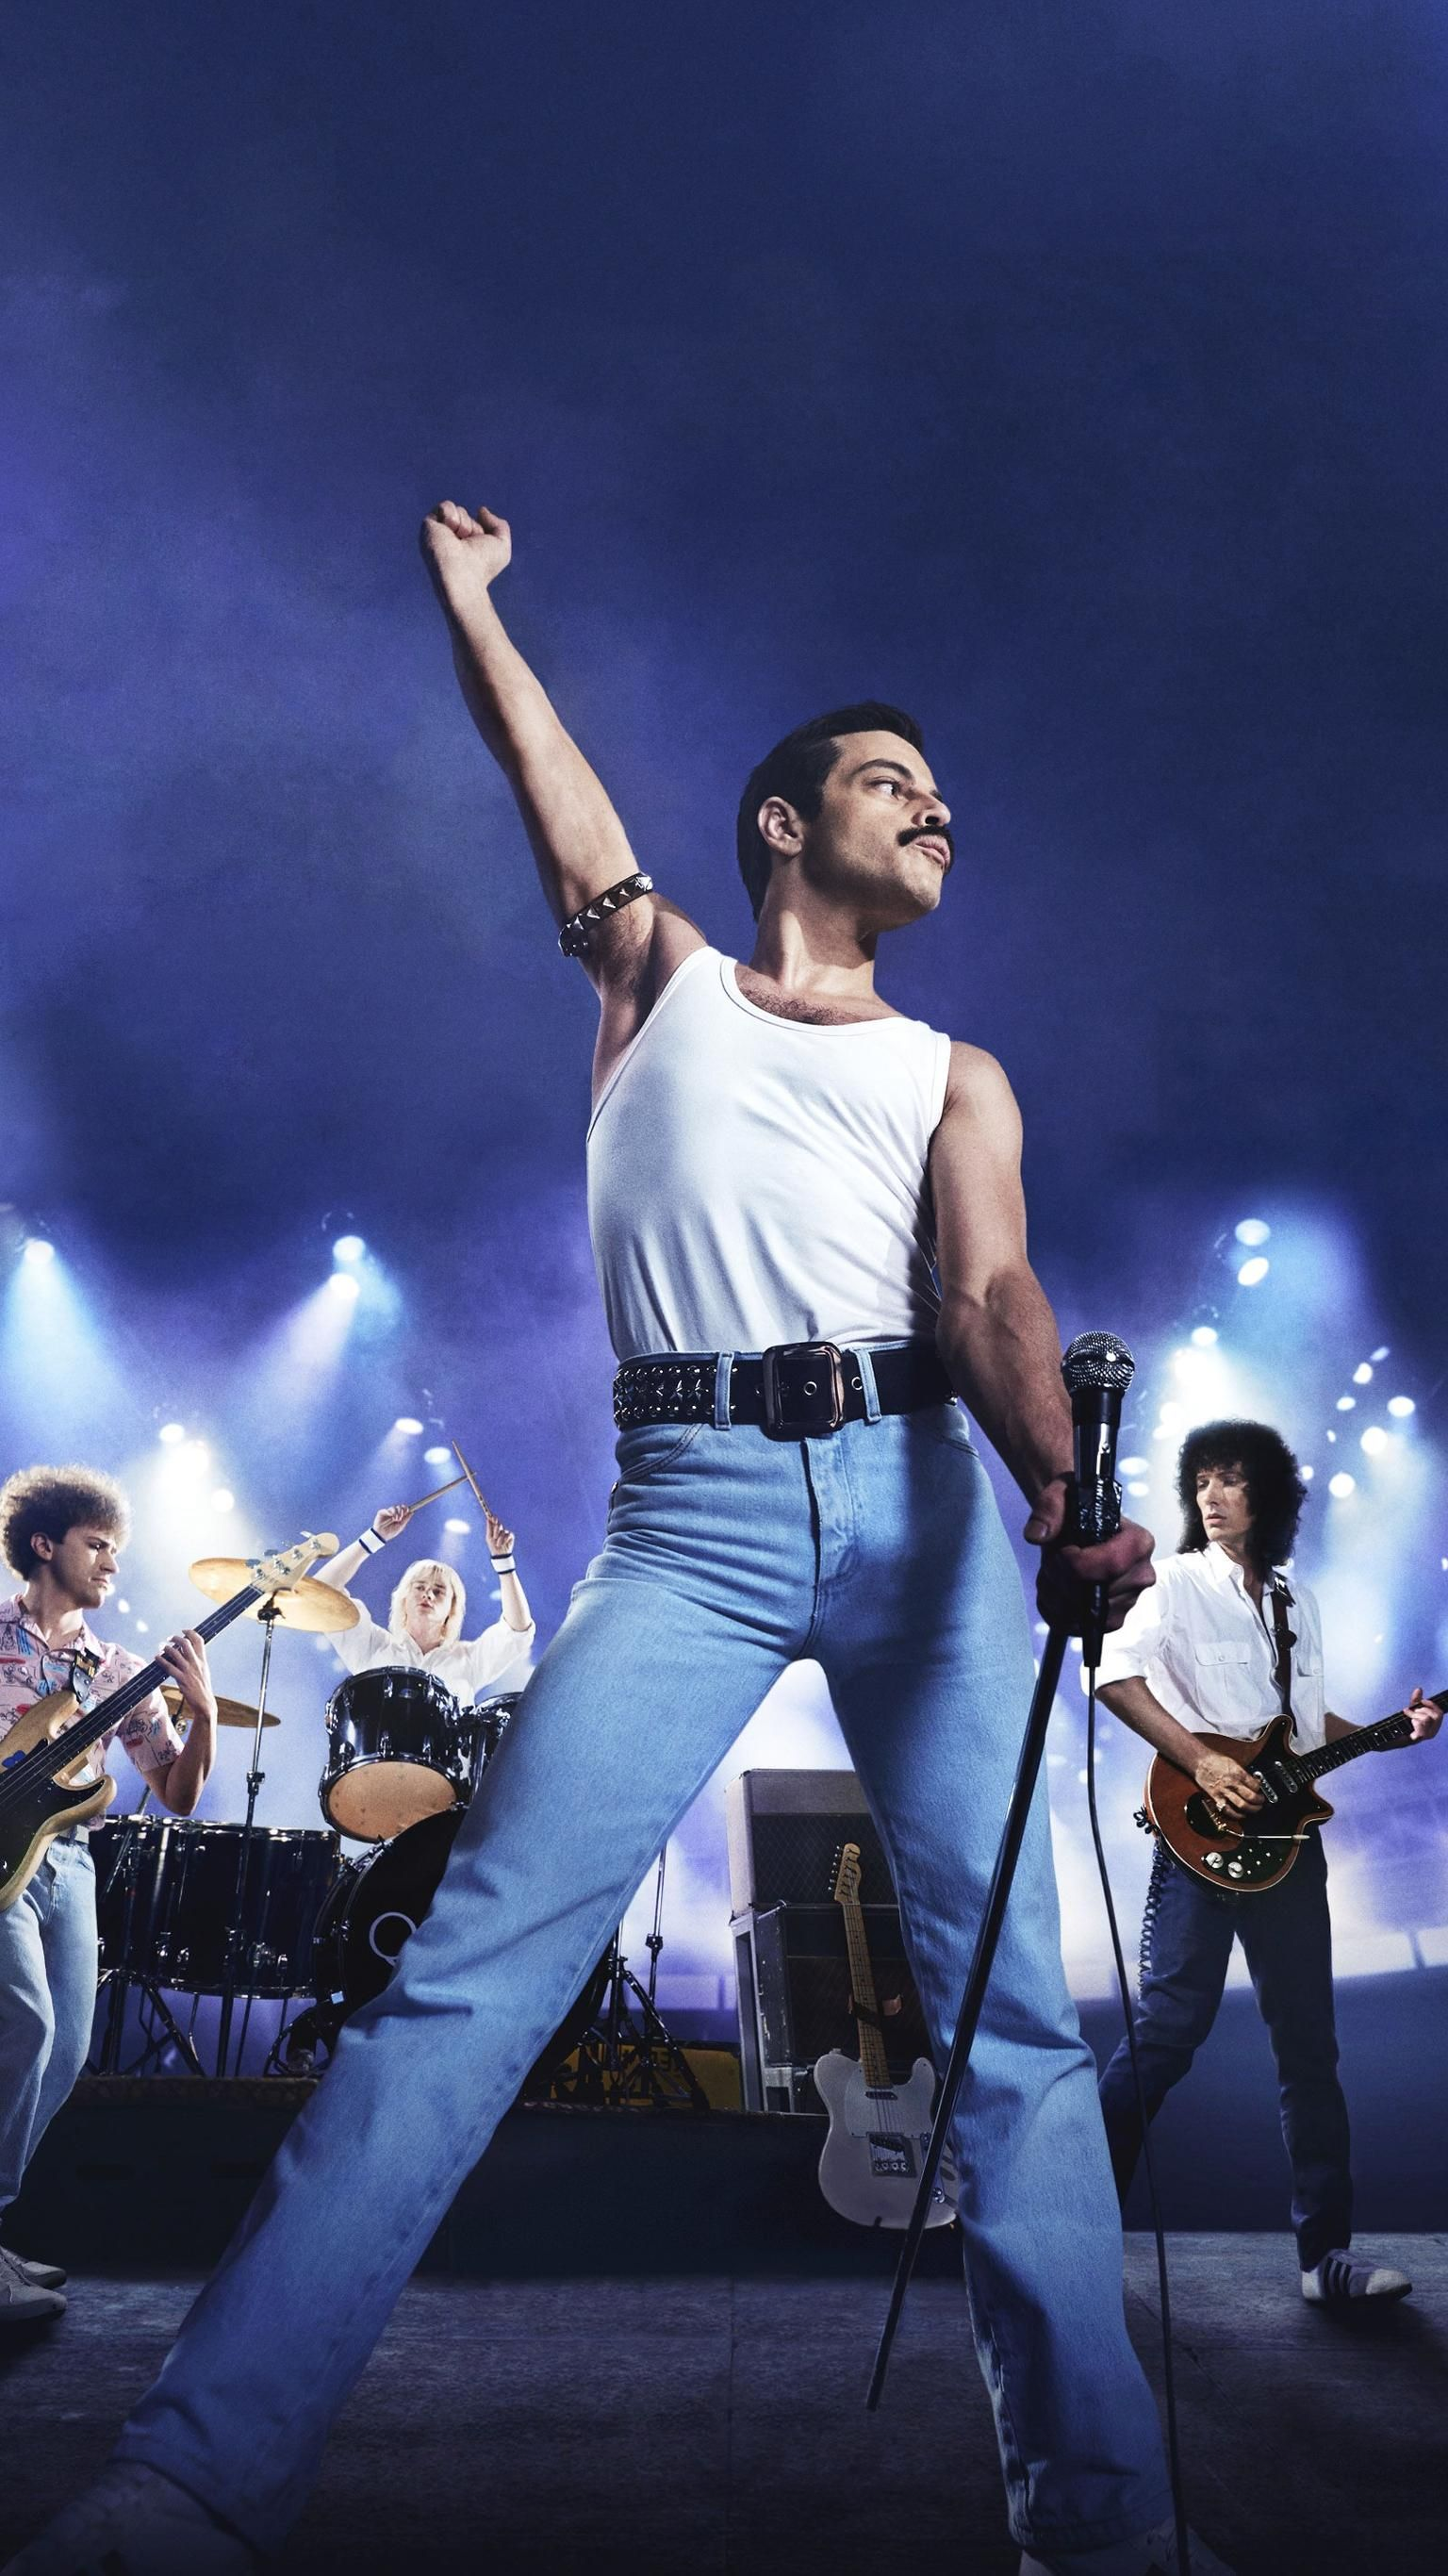 Bohemian Rhapsody 2018 Phone Wallpaper Moviemania Queen Movie Bohemian Rhapsody Queen Freddie Mercury